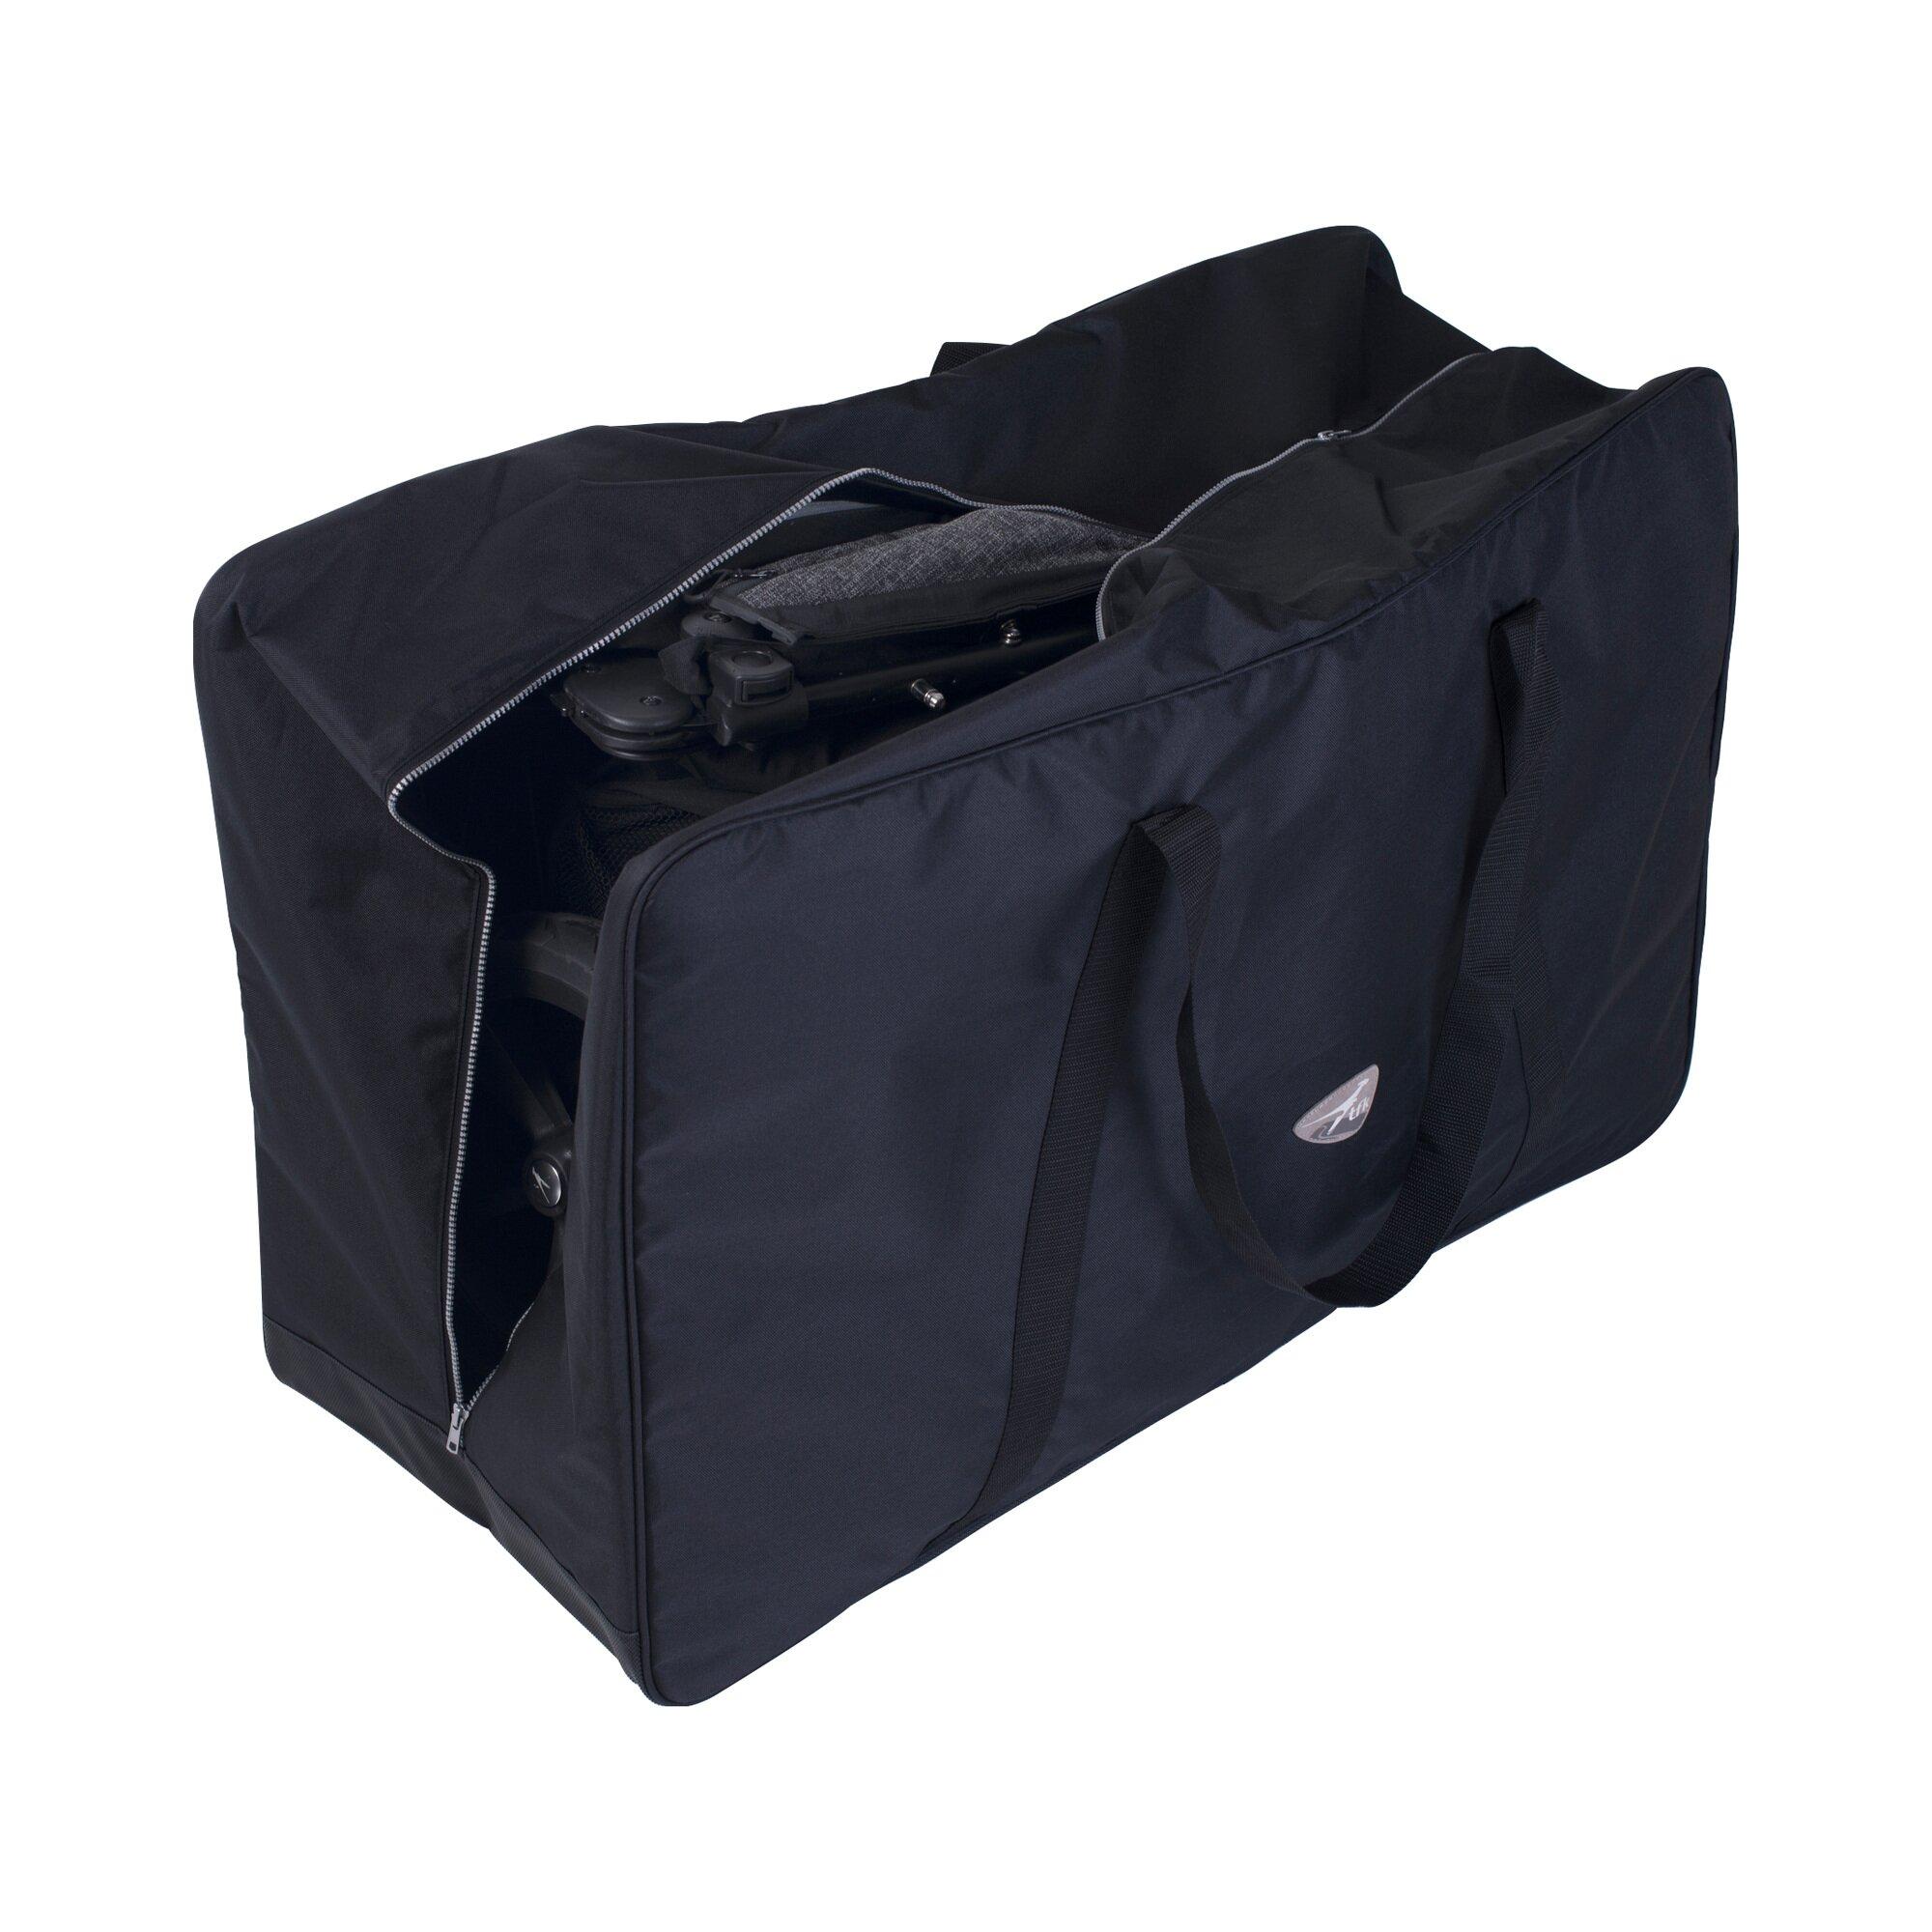 tfk-transporttasche-fur-joggster-modelle-schwarz